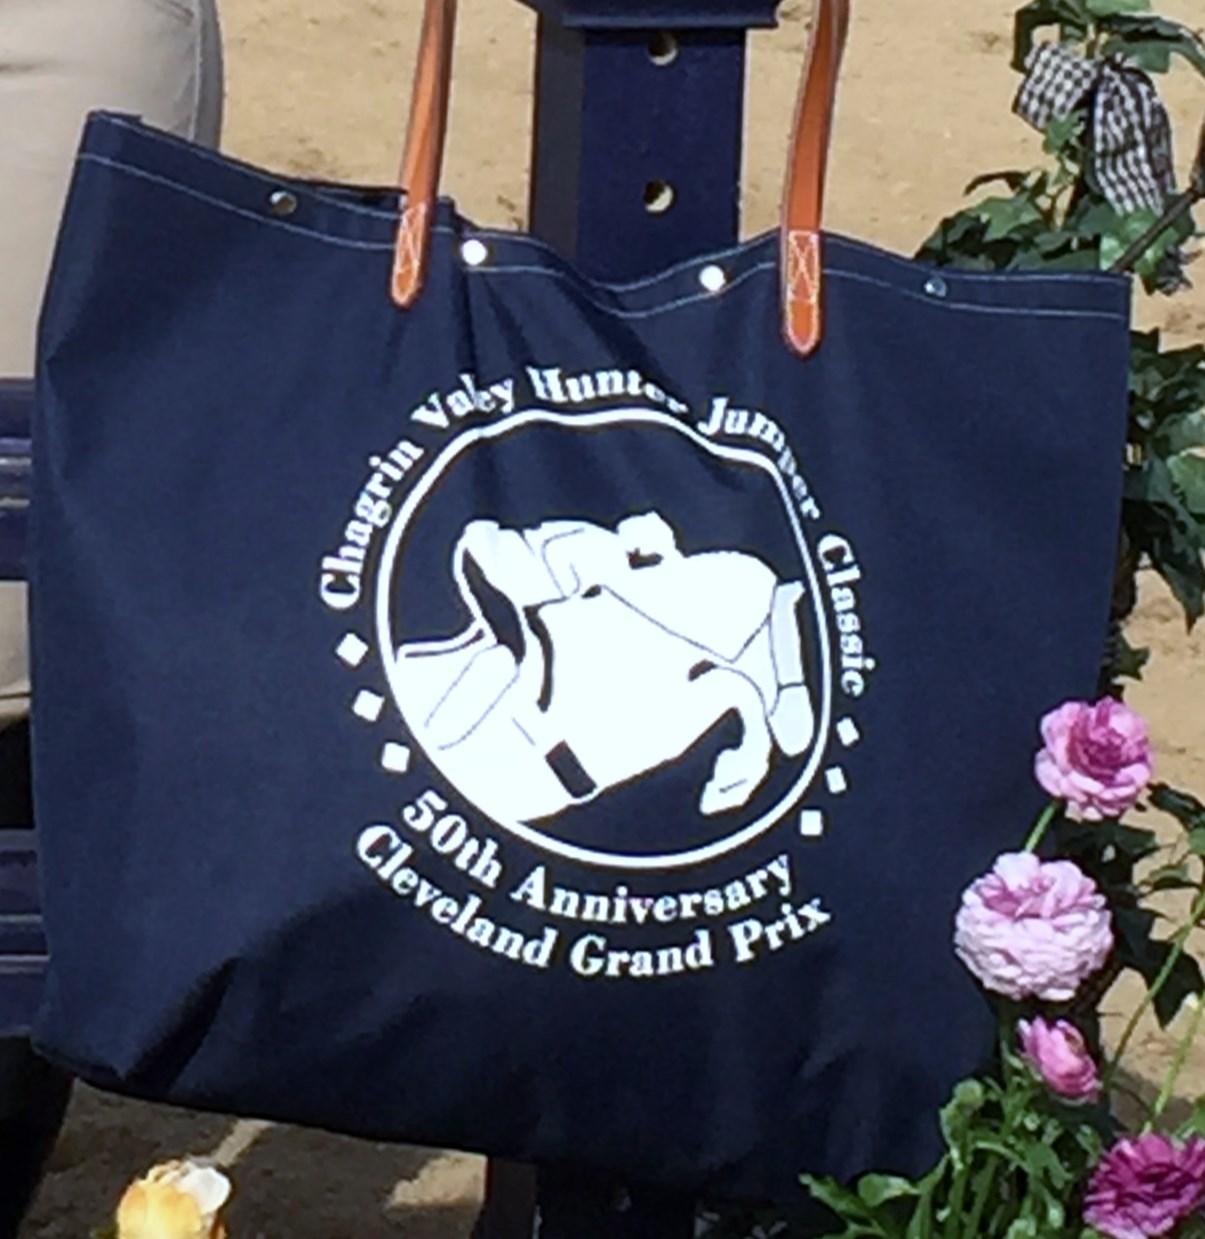 CVHJC Bag 1 vendor